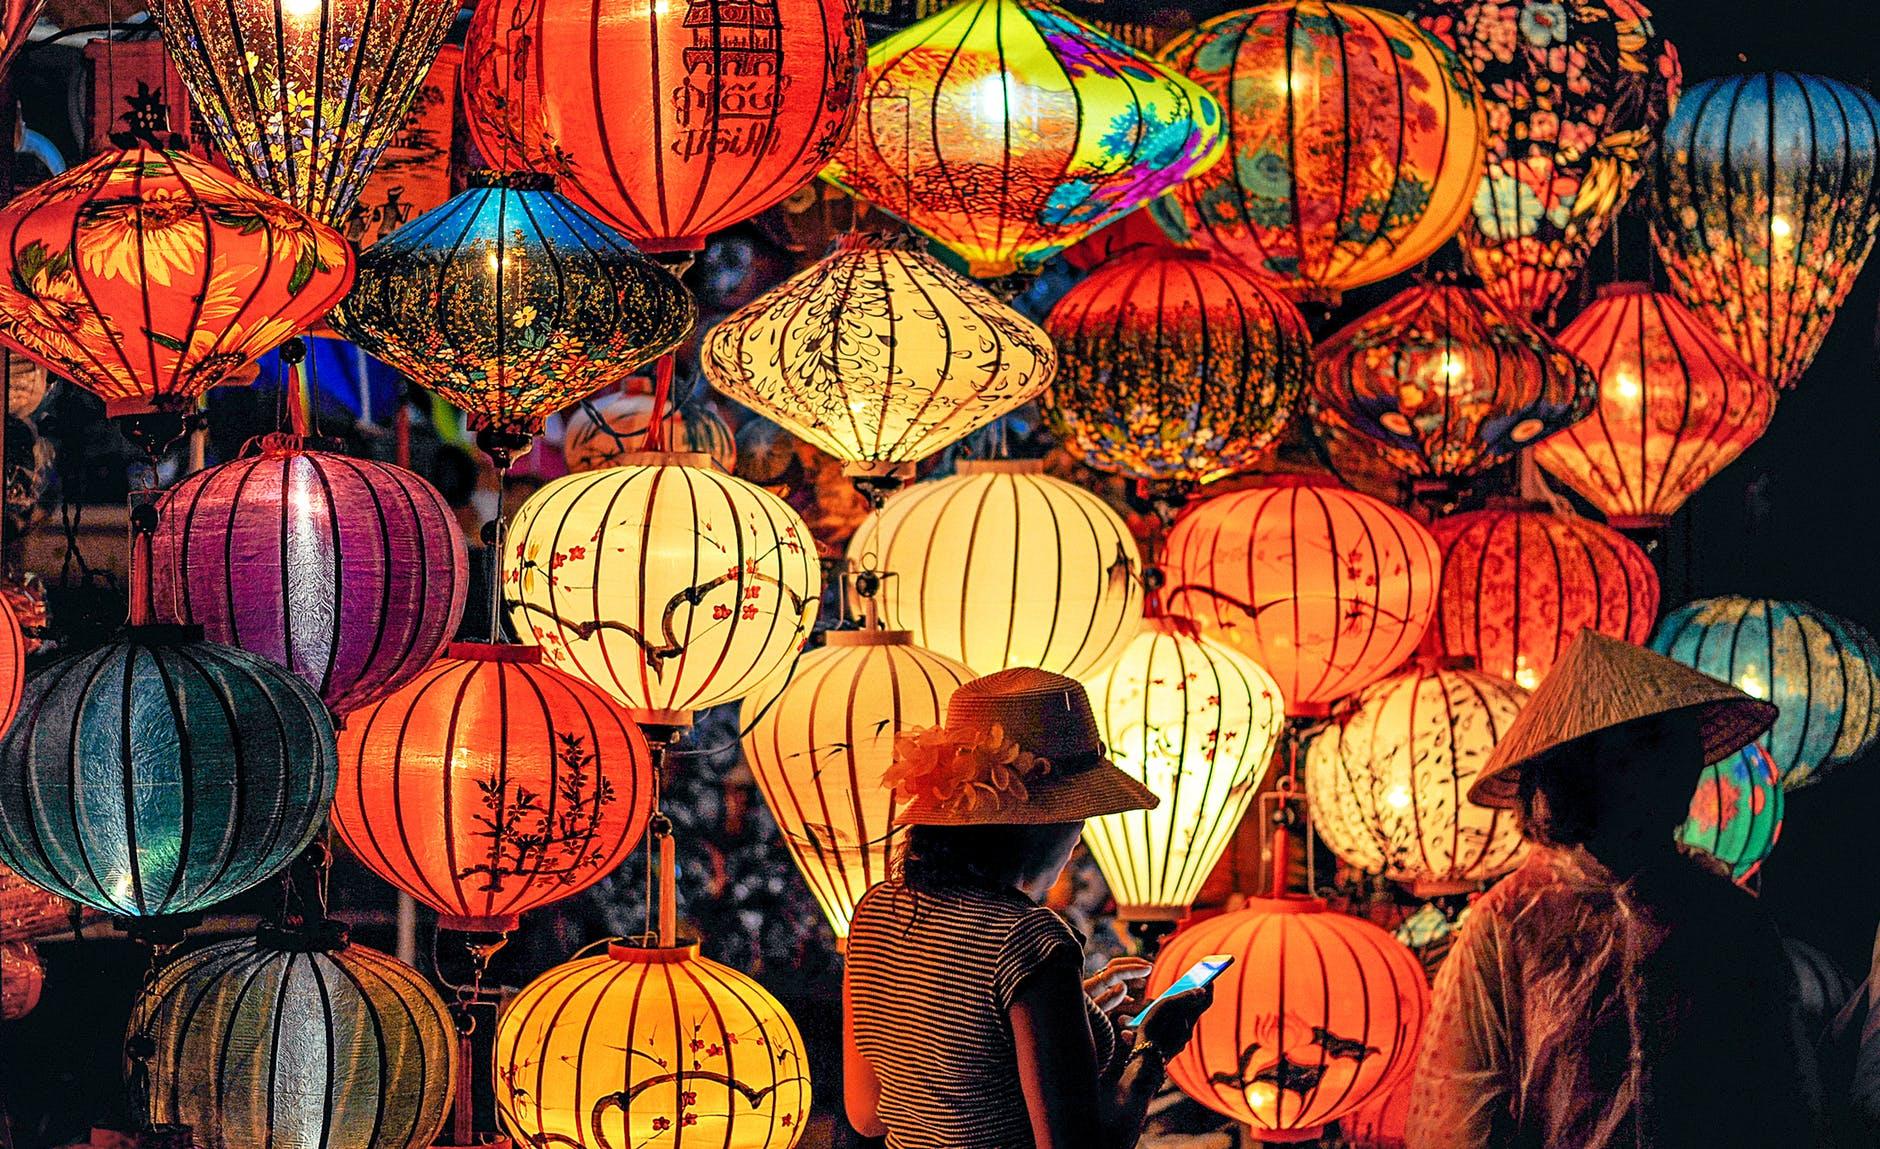 Mid-Autumn Festival 2019 – The Harvest and Children's Festival